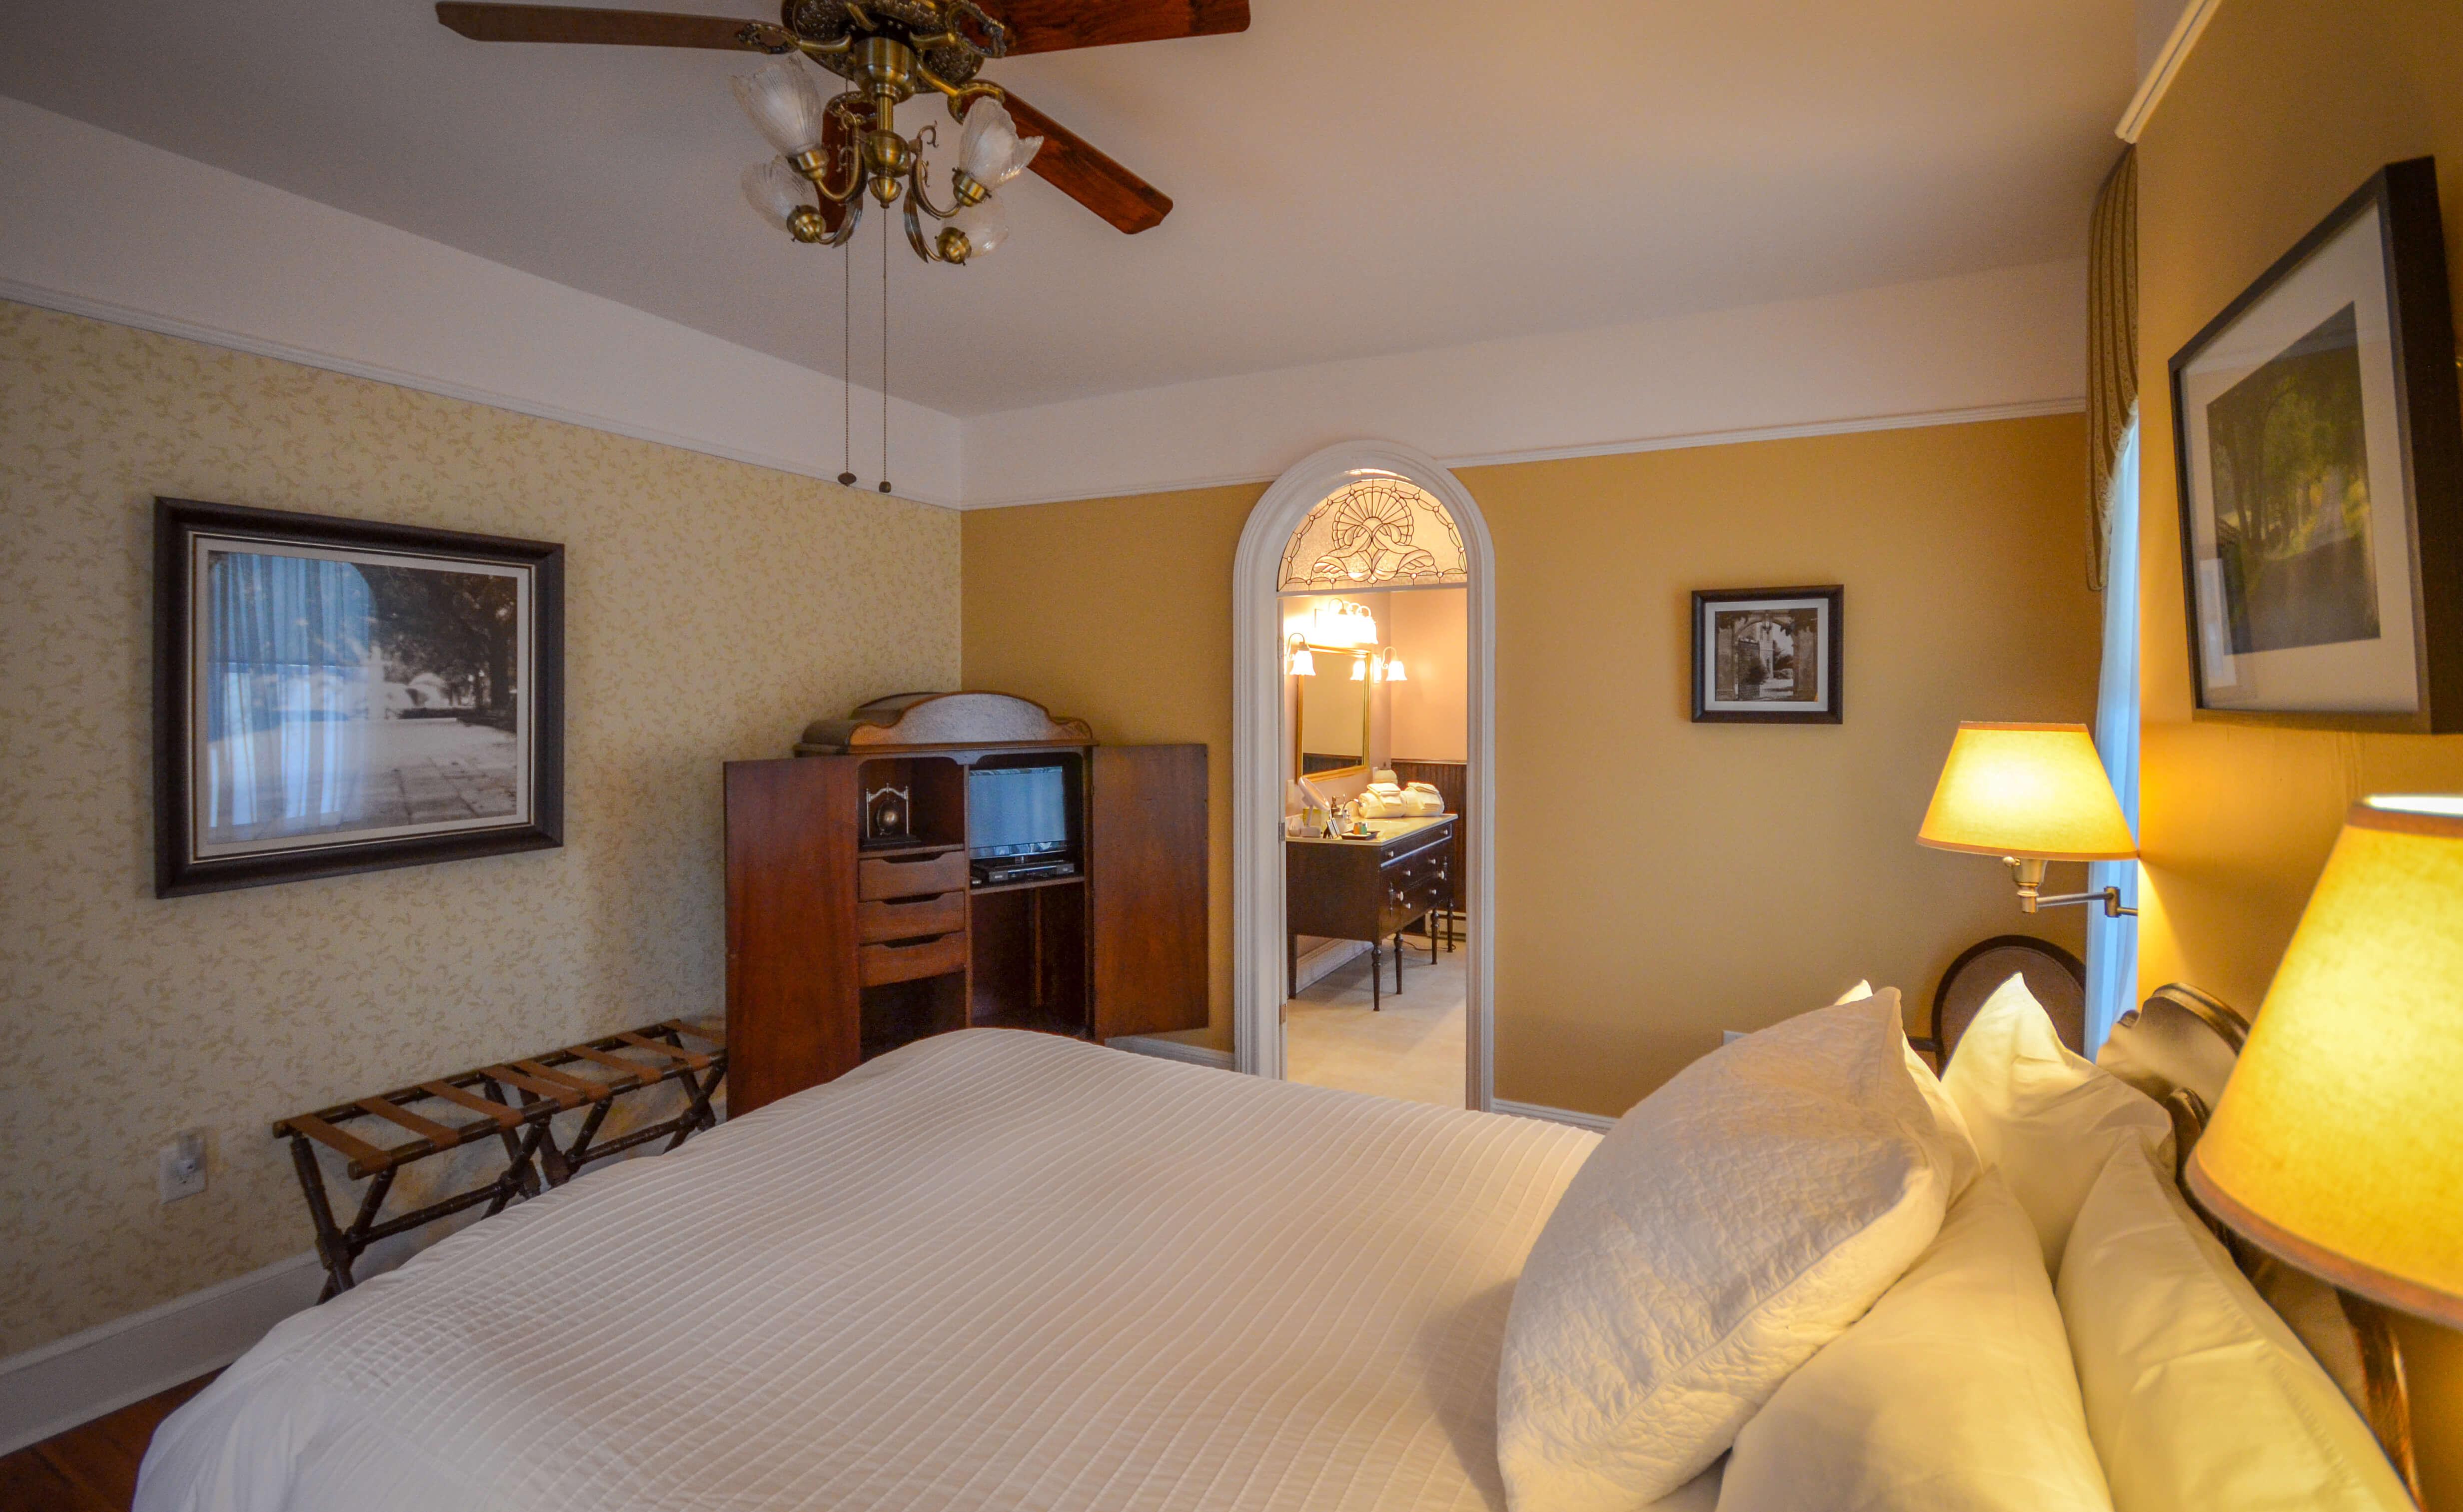 Traveler's Retreat Room - Waypoint House B+B